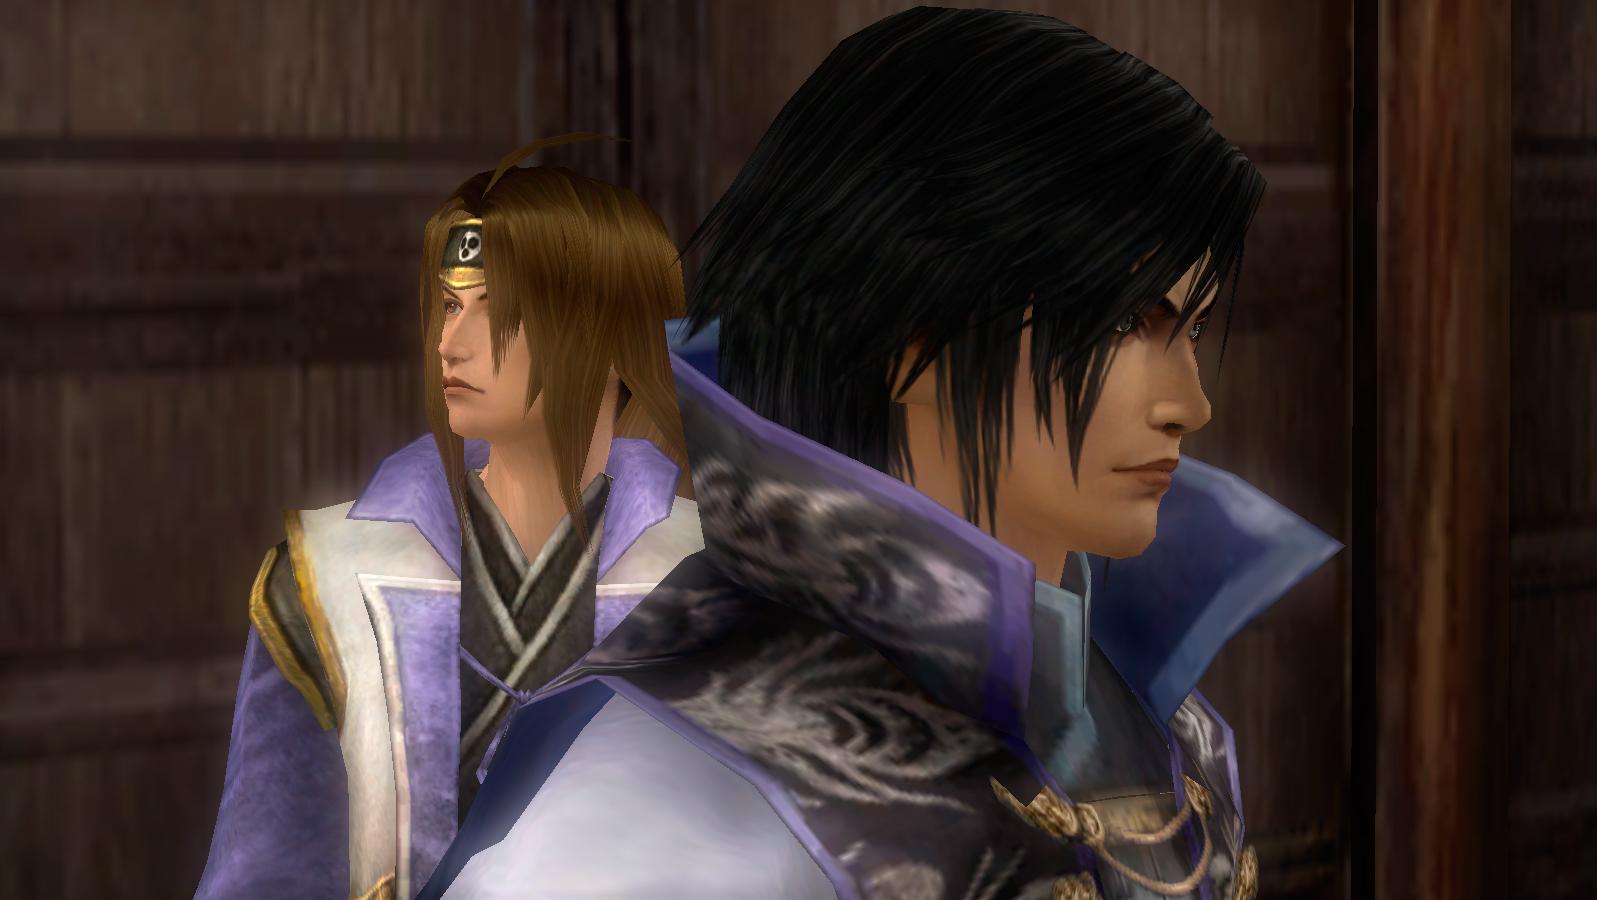 Wei (Warriors Orochi)